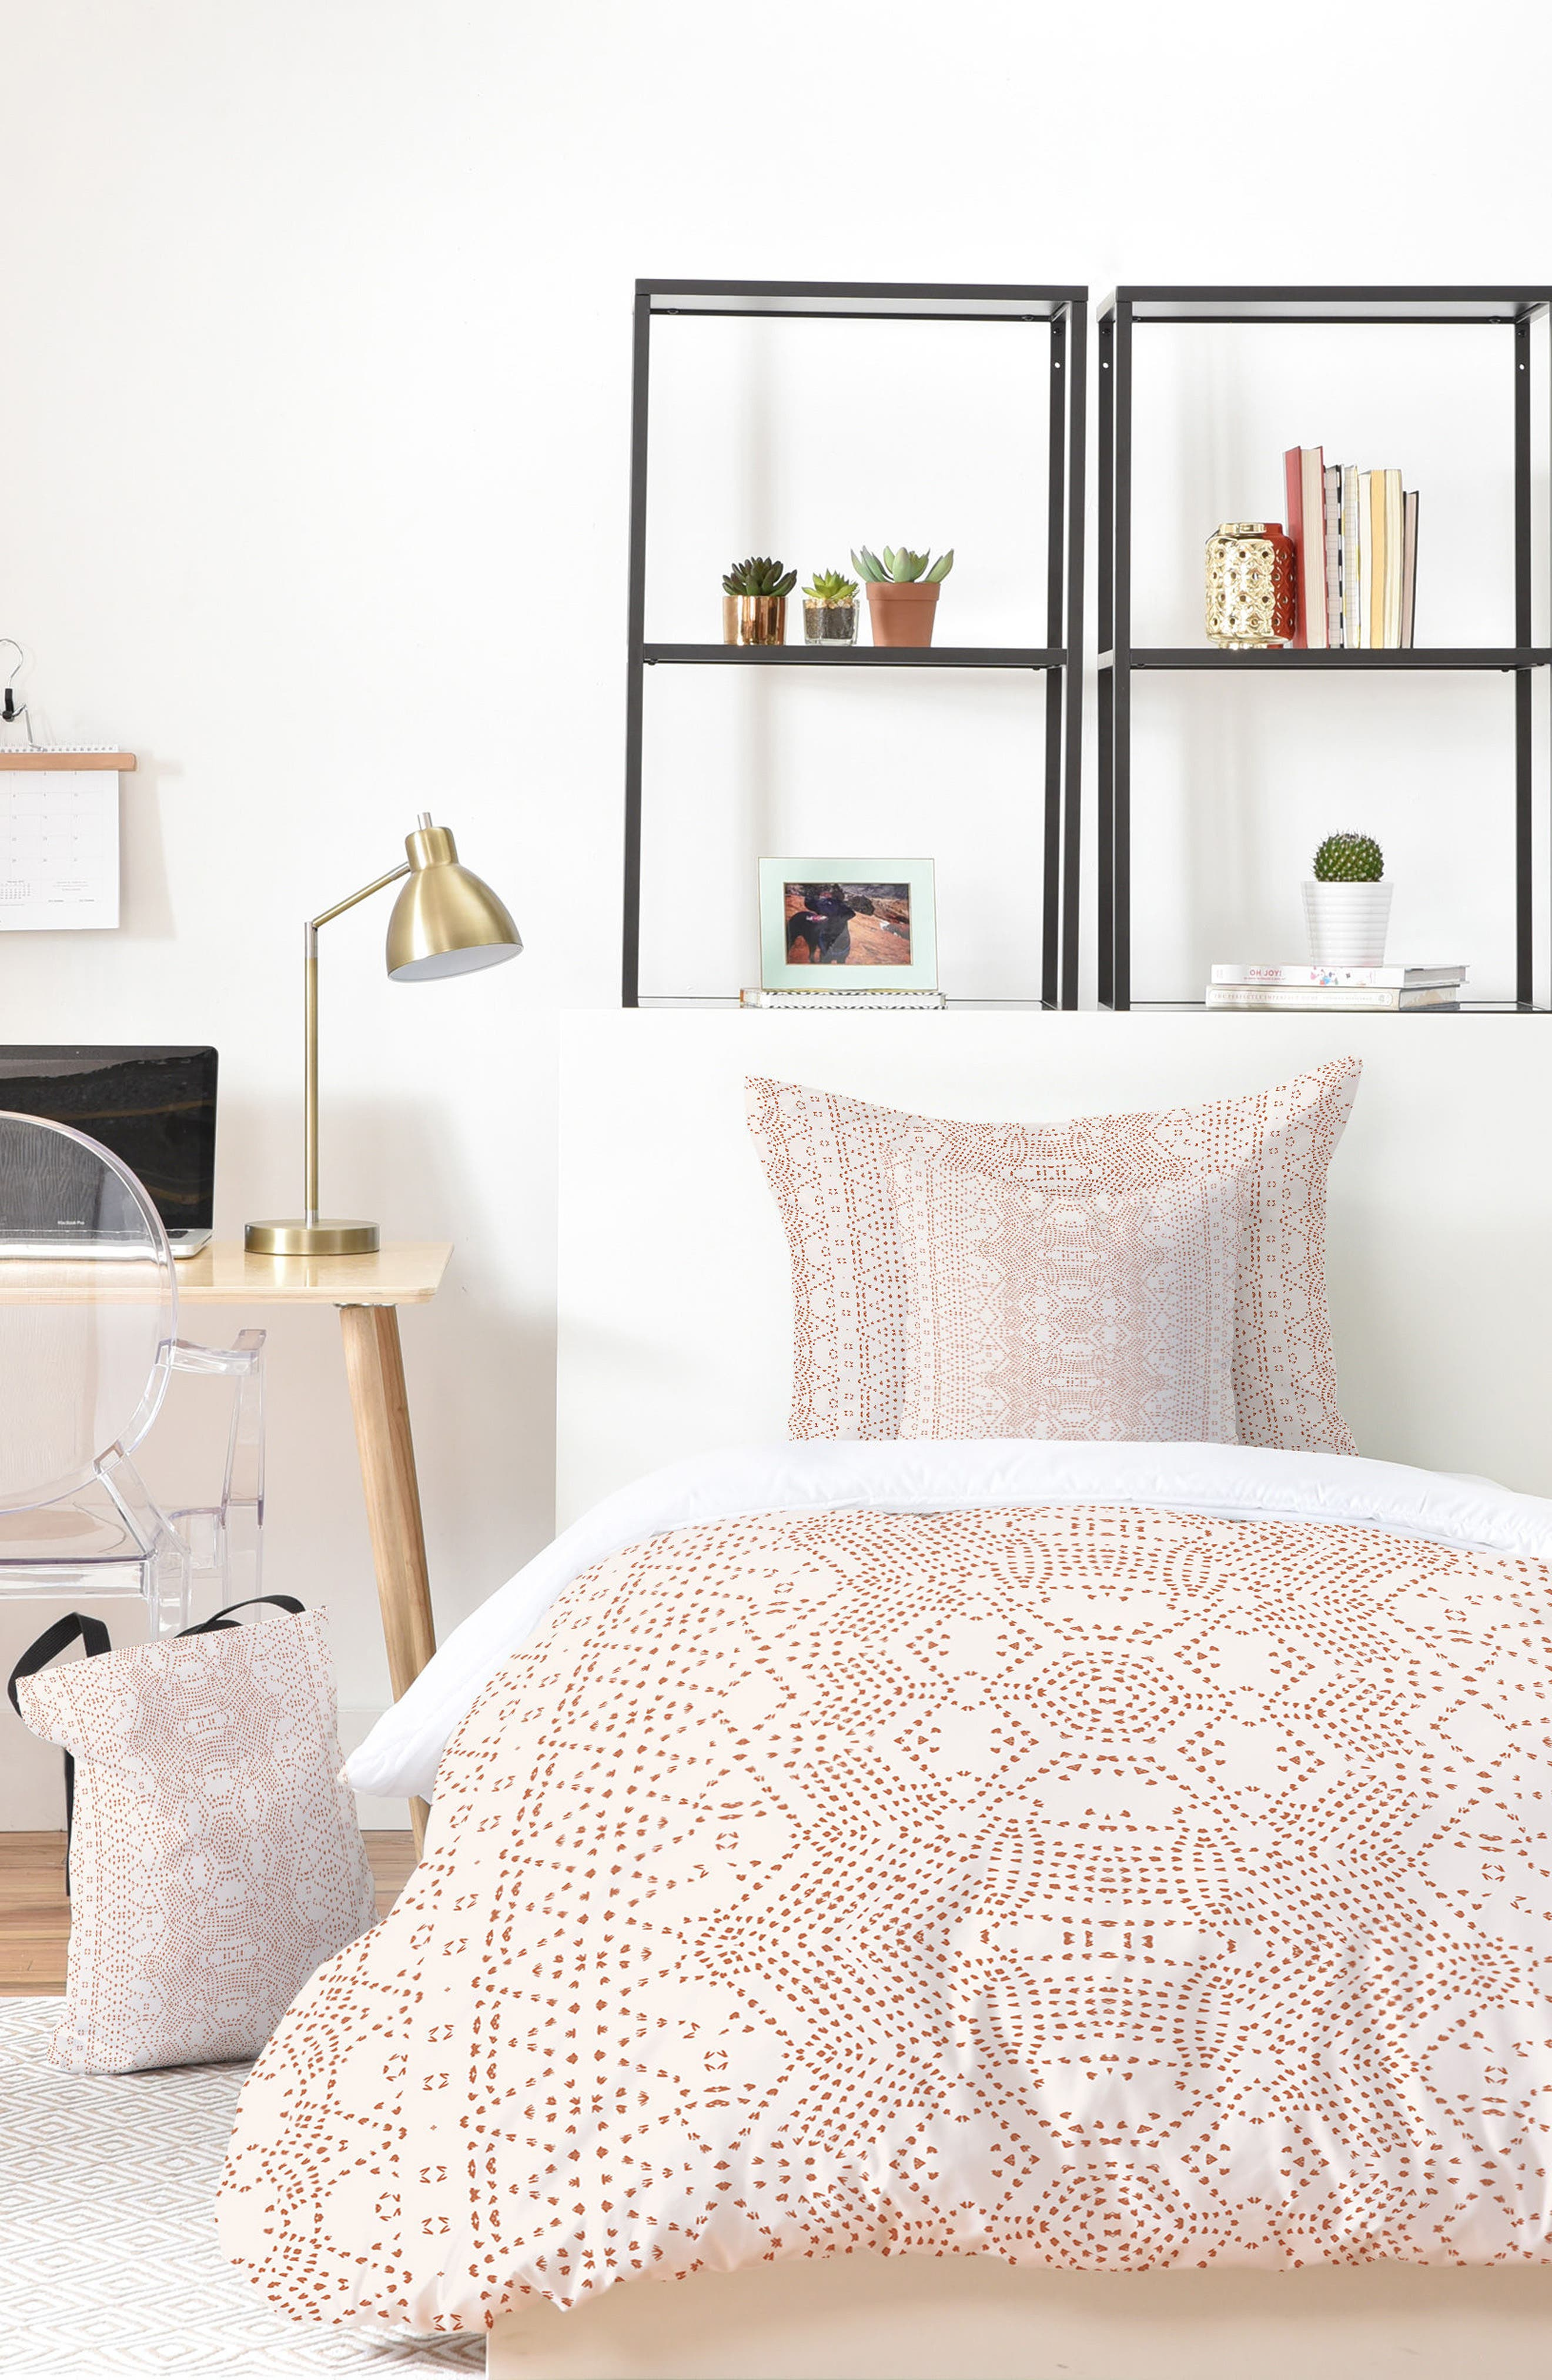 Main Image - Deny Designs Holli Zollinger Marrakeshi Bed in a Bag Duvet Cover, Sham & Accent Pillow Set